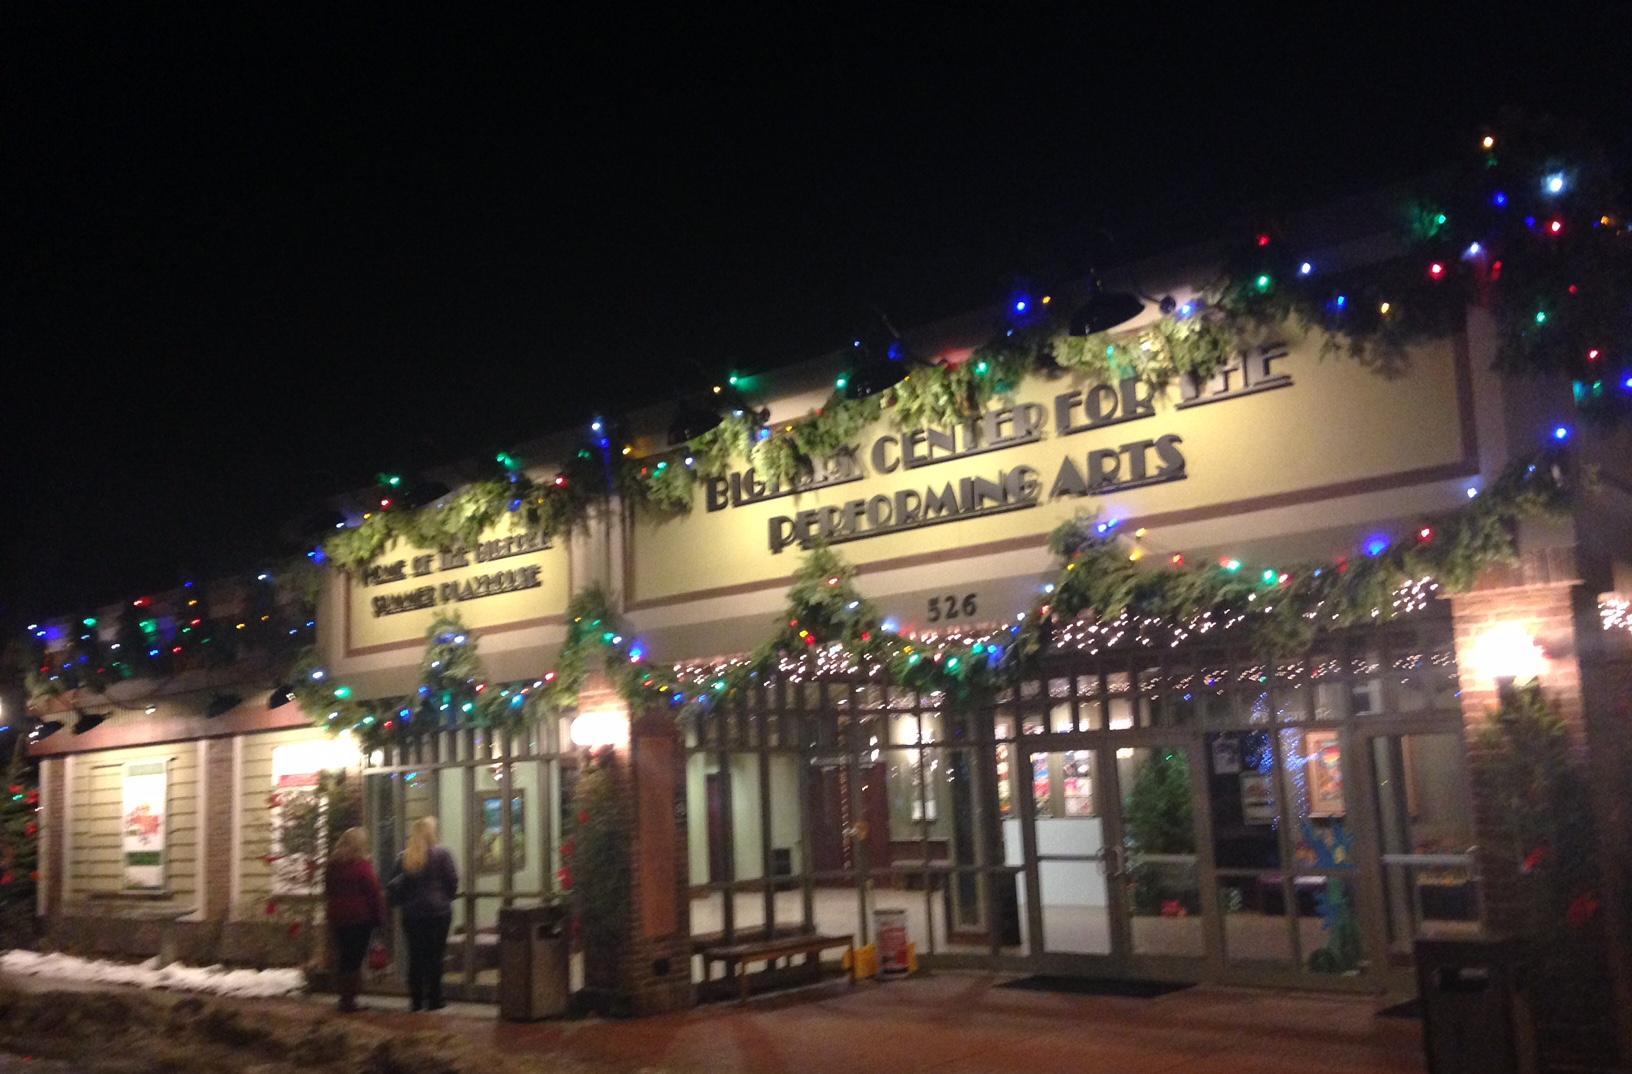 Twinkling lights in downtown Bigfork.